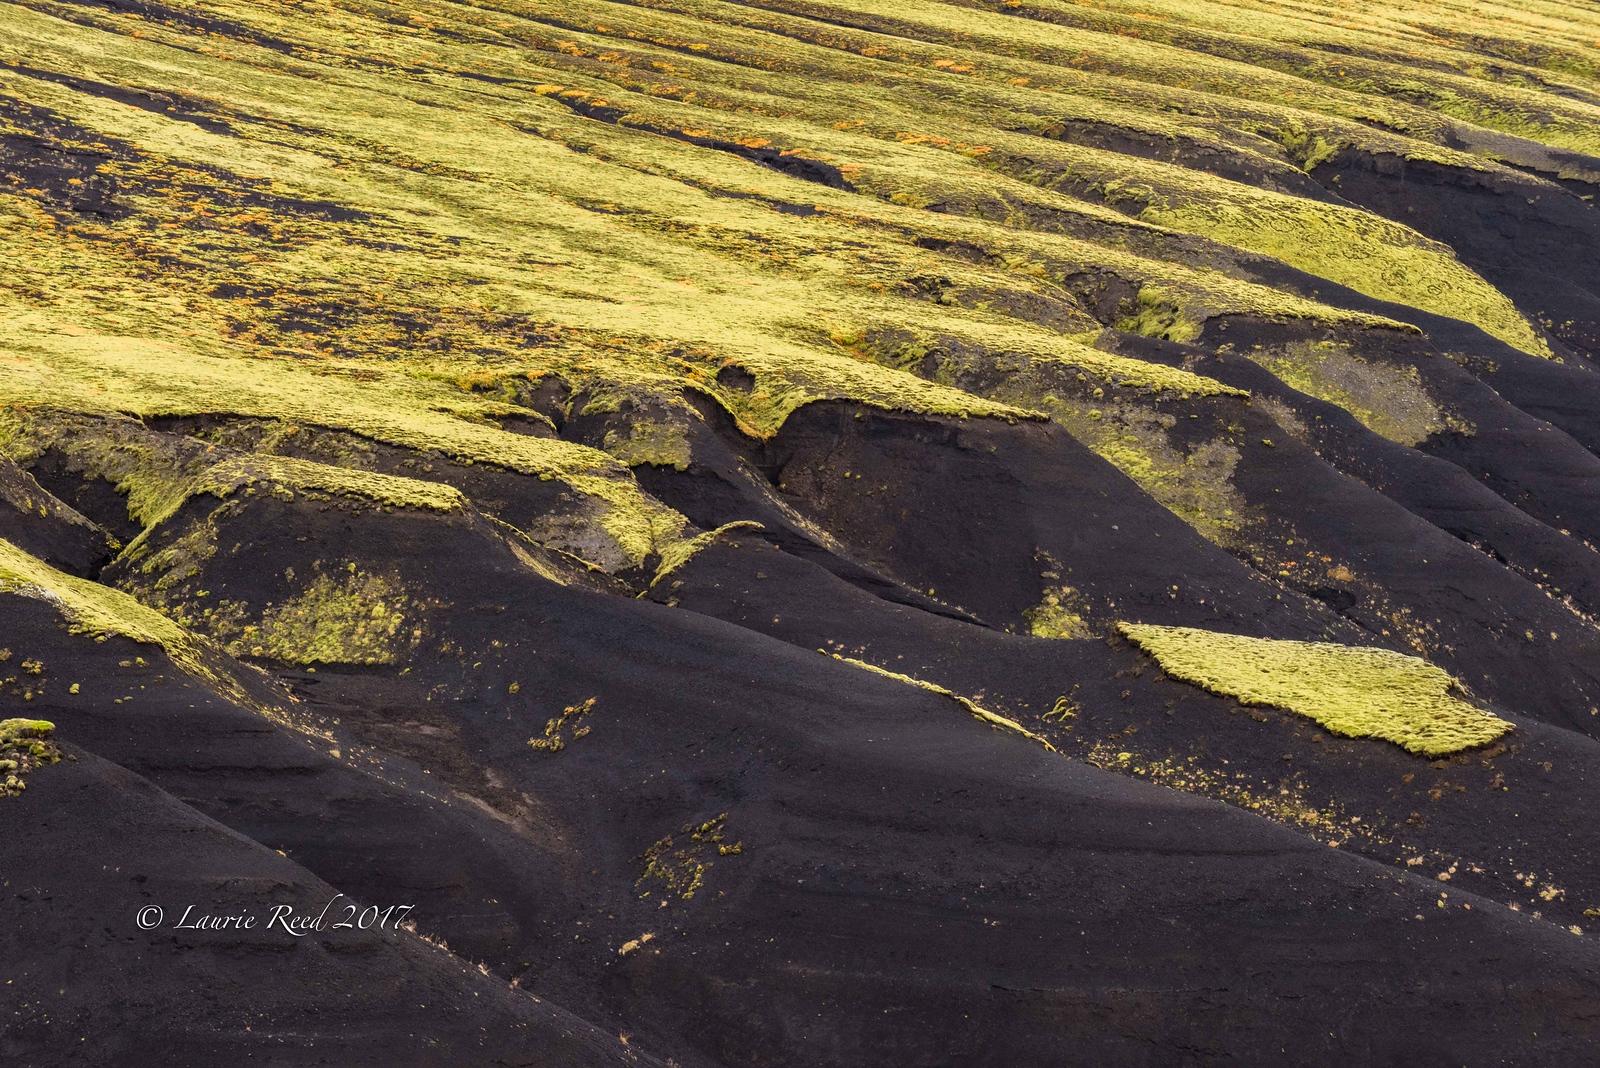 Volcanic cinder ripples